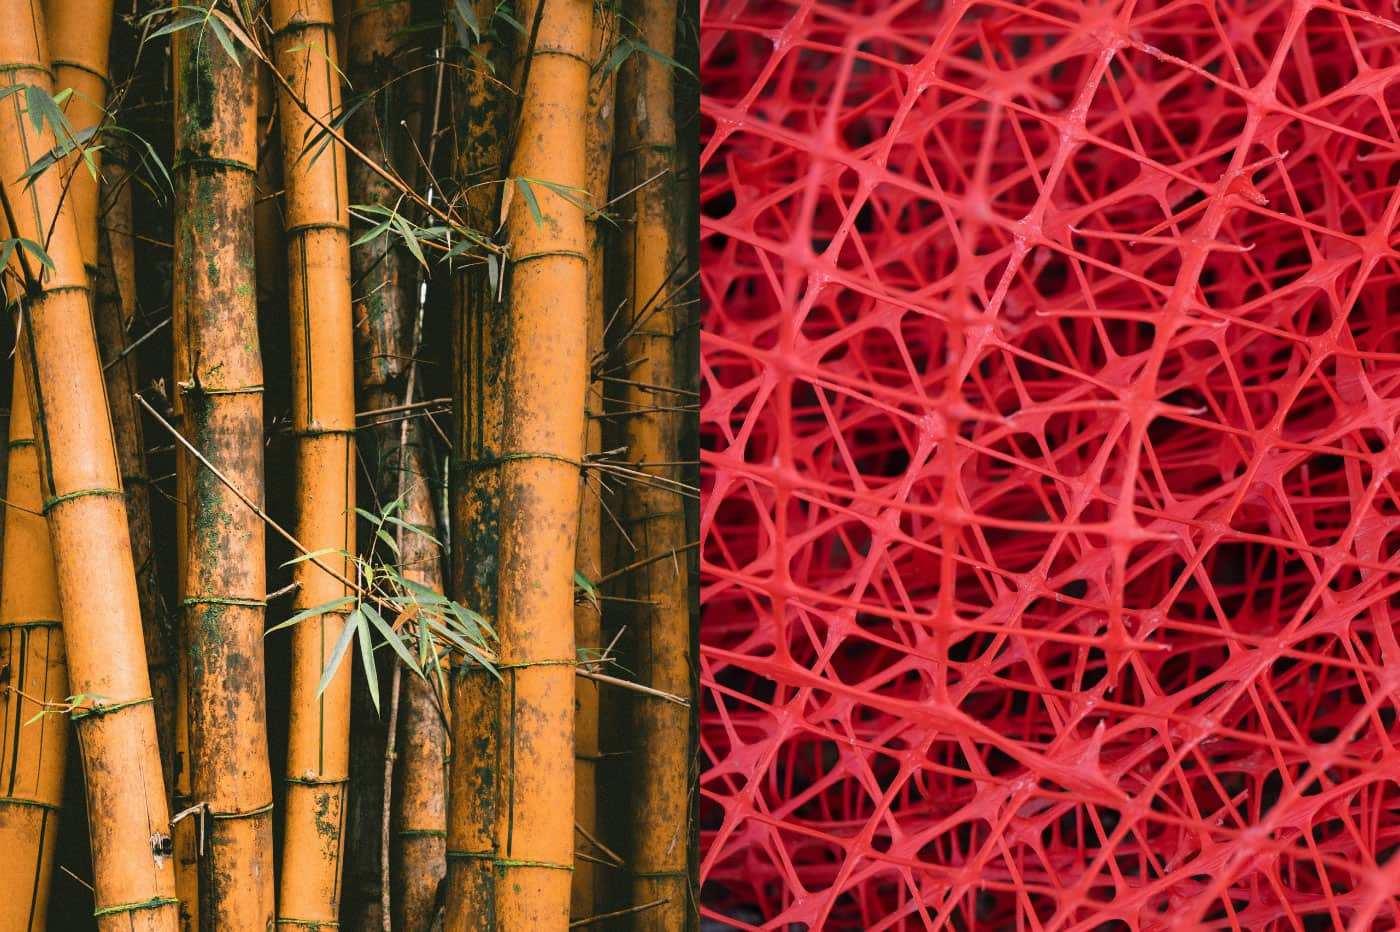 Bambus gegen Plastik - Headbild (links Bambus, rechts Plastik)